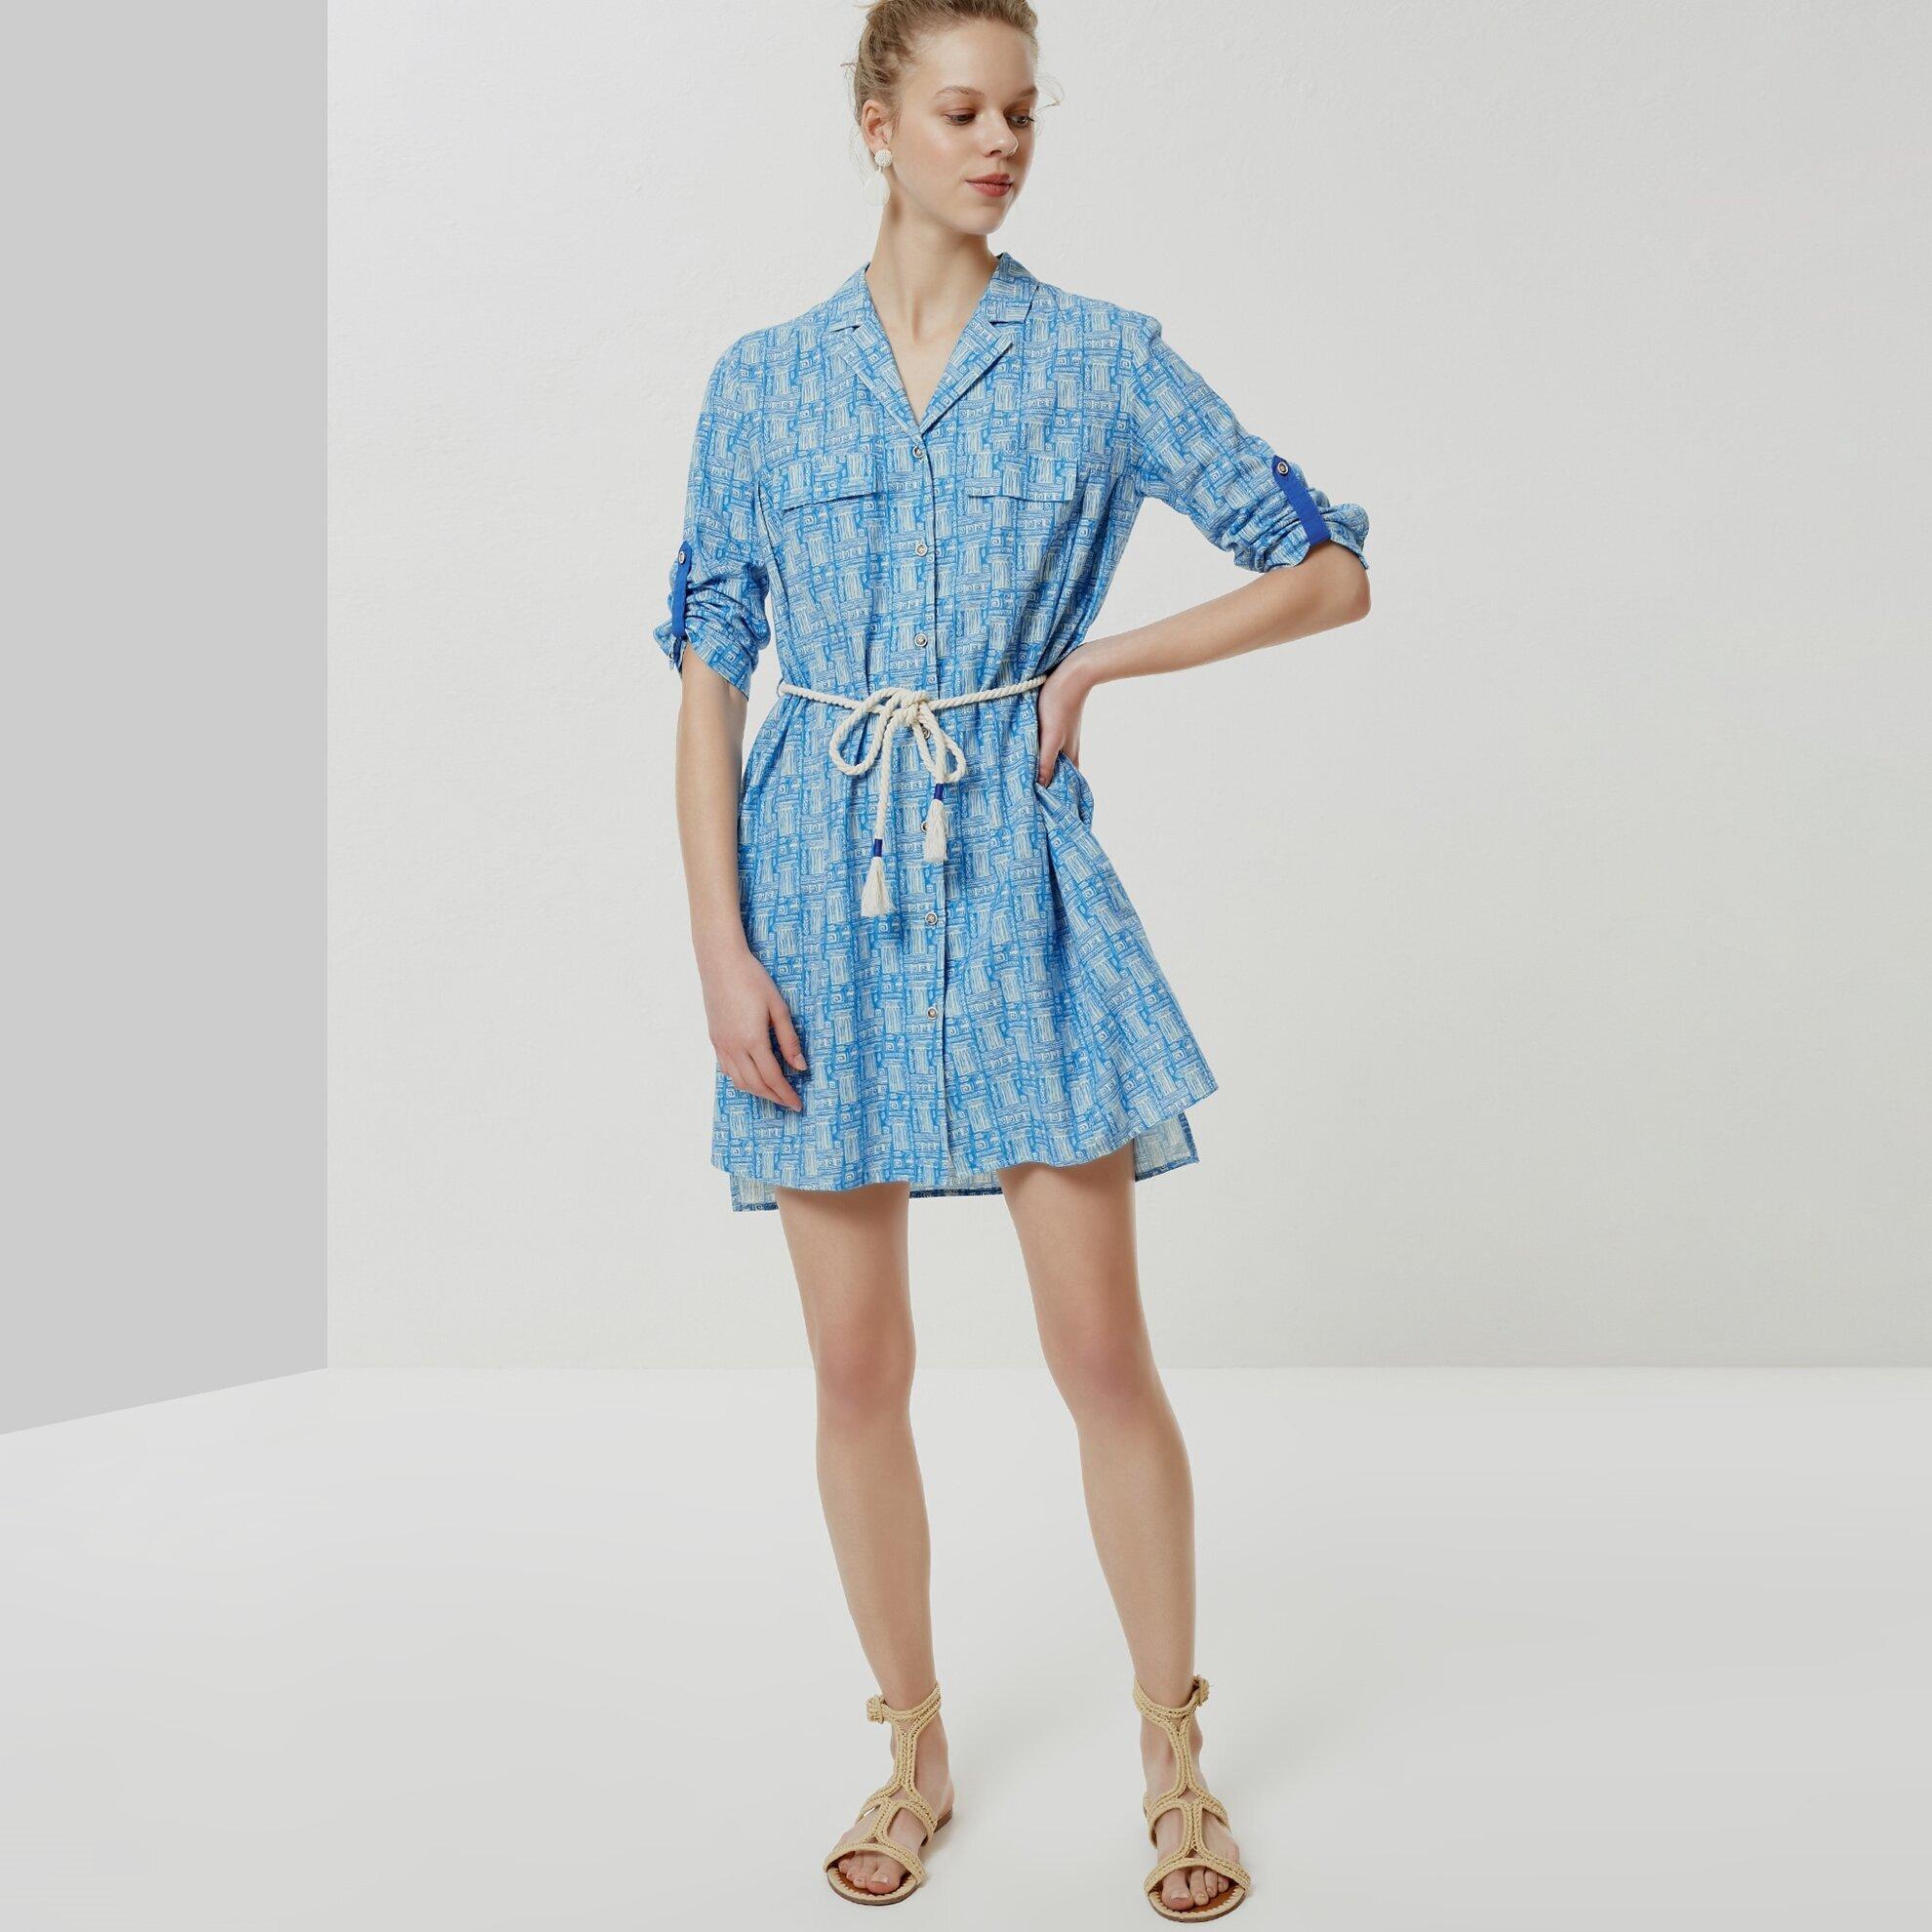 A Form Gömlek Elbise